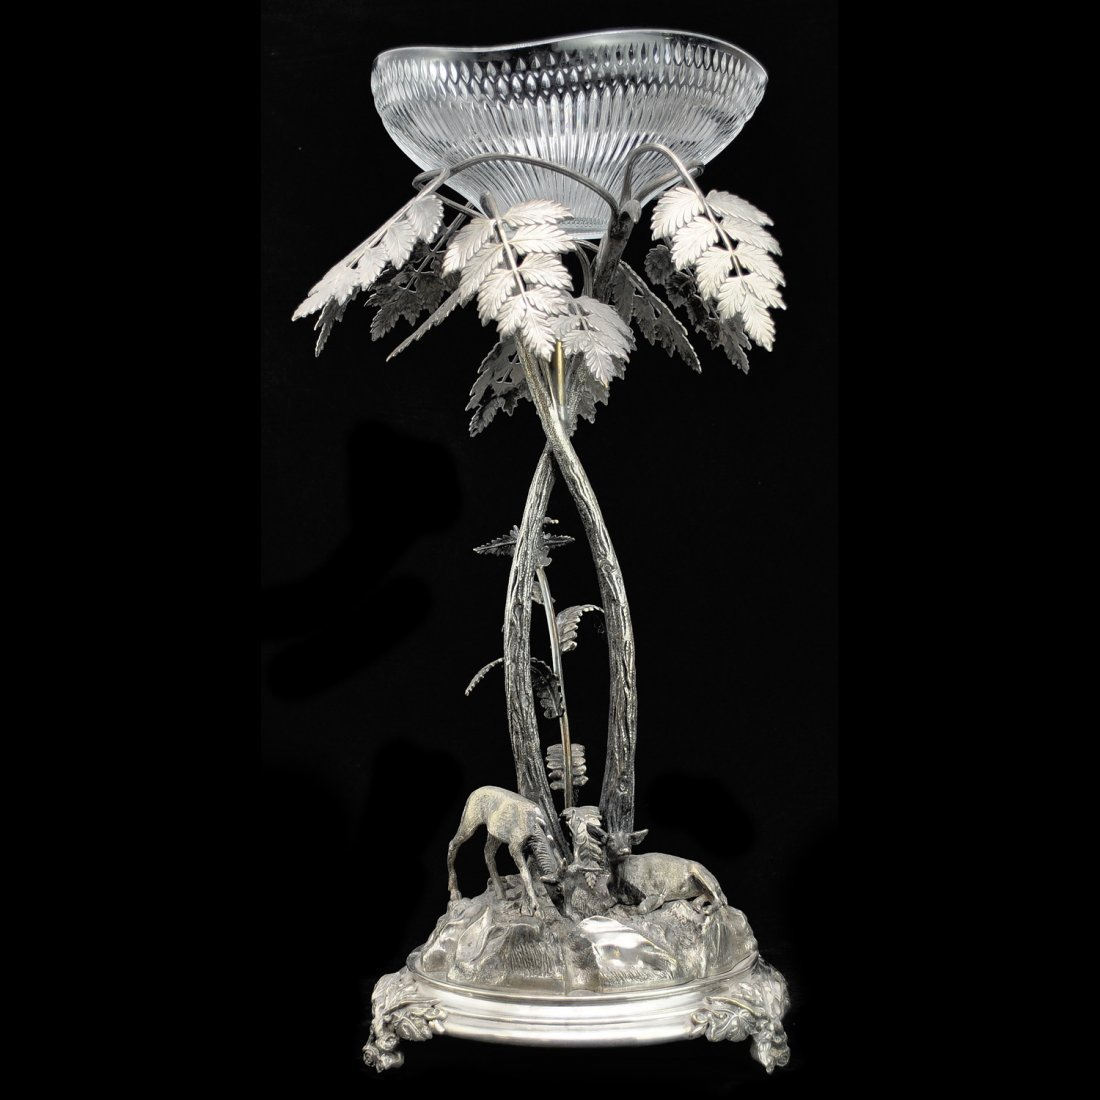 12: BORDSUPPSATS, nysilver, 1800-talets slut, A.G Dufva